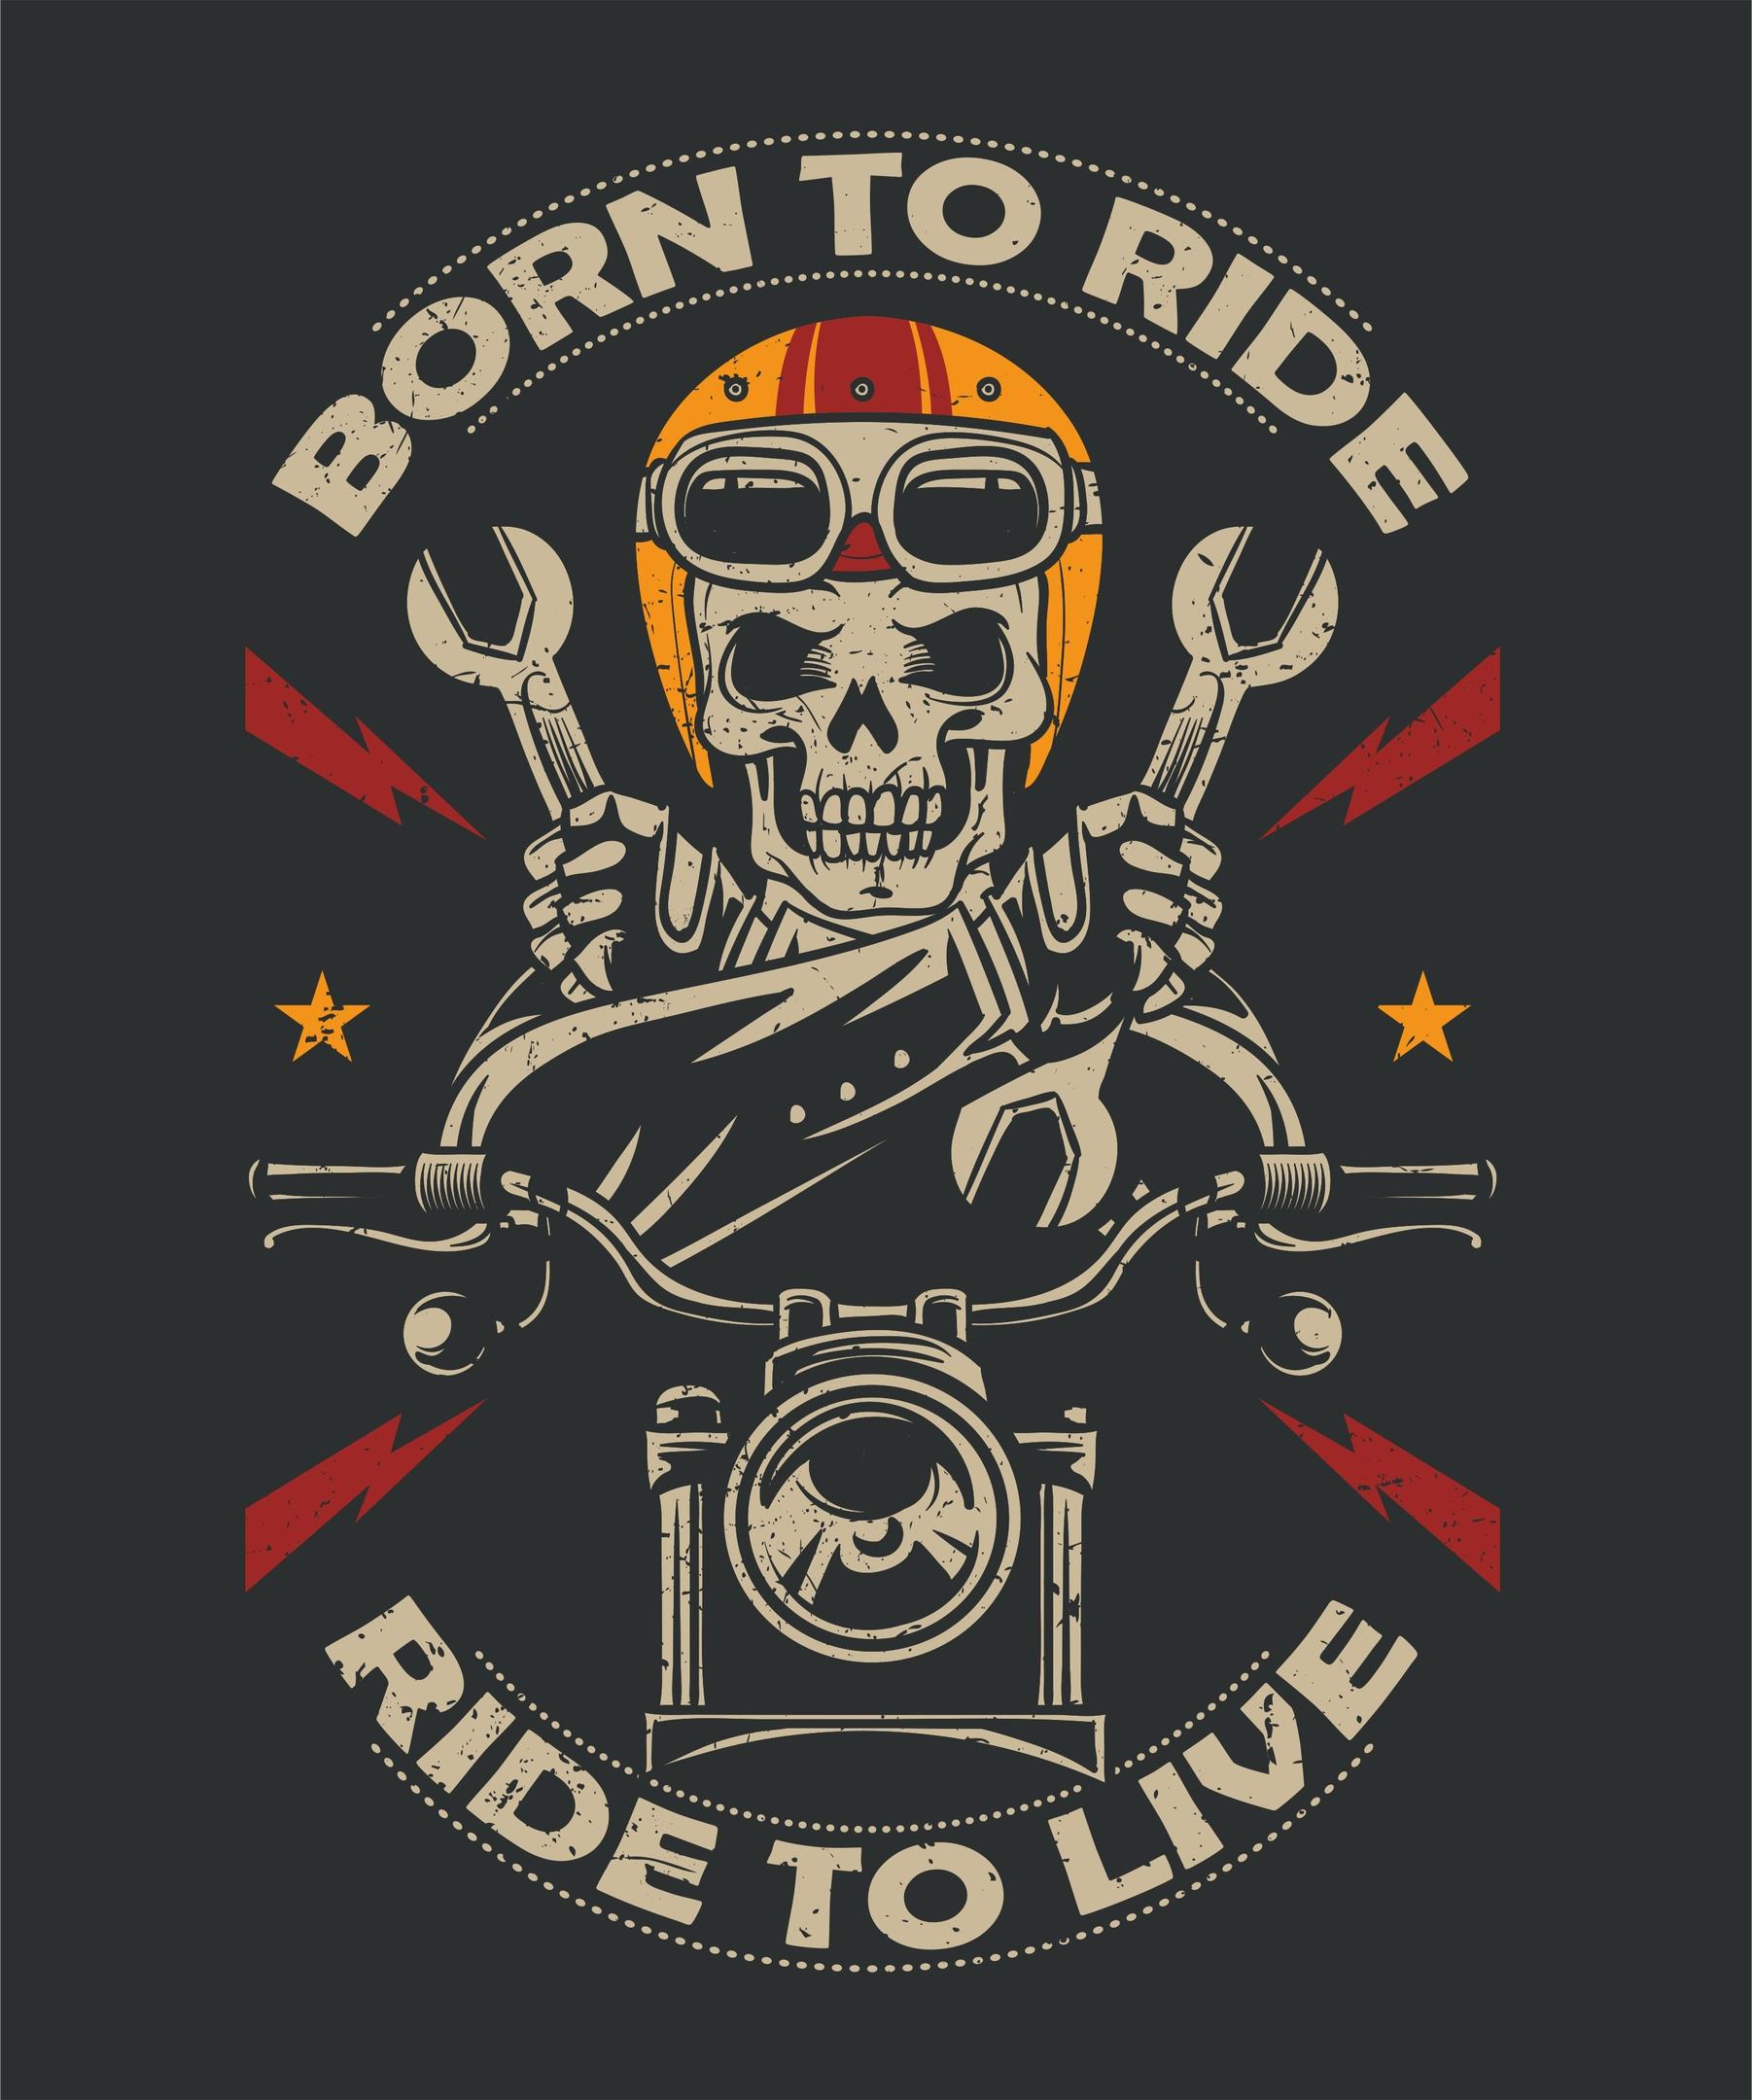 Born To Ride Moto Print Free Vector